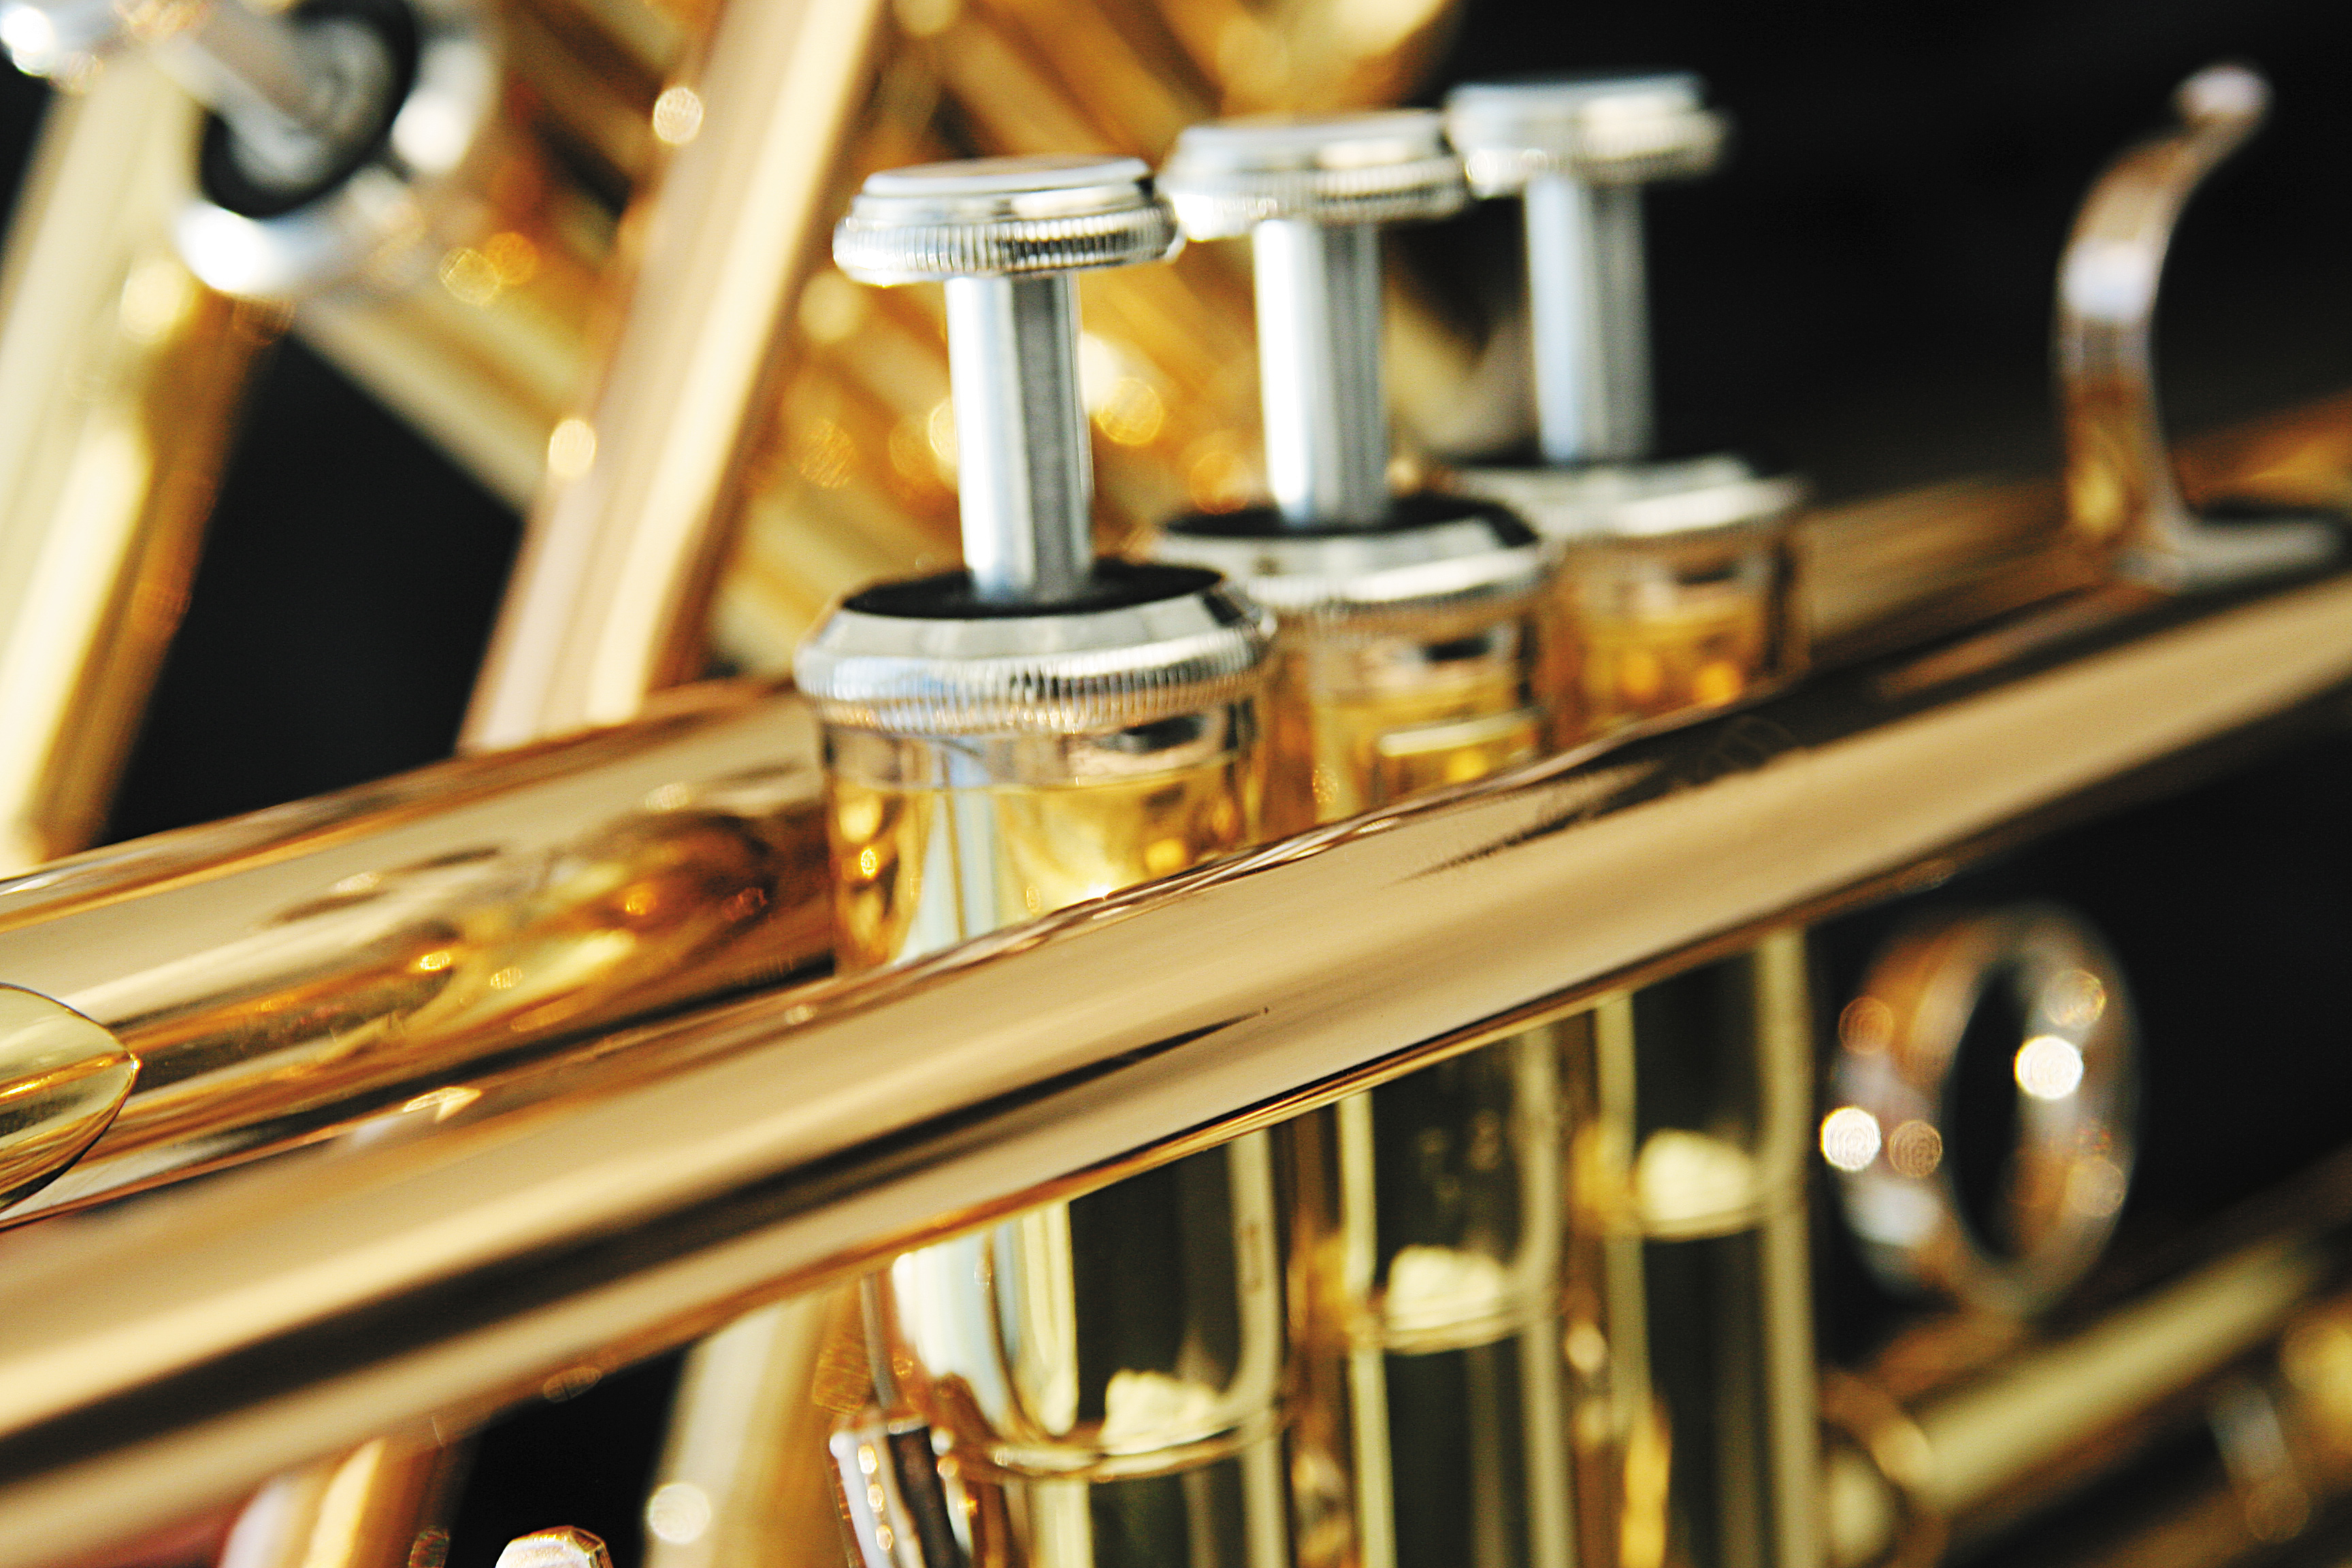 http://www.morguefile.com/archive/#/?q=trumpet